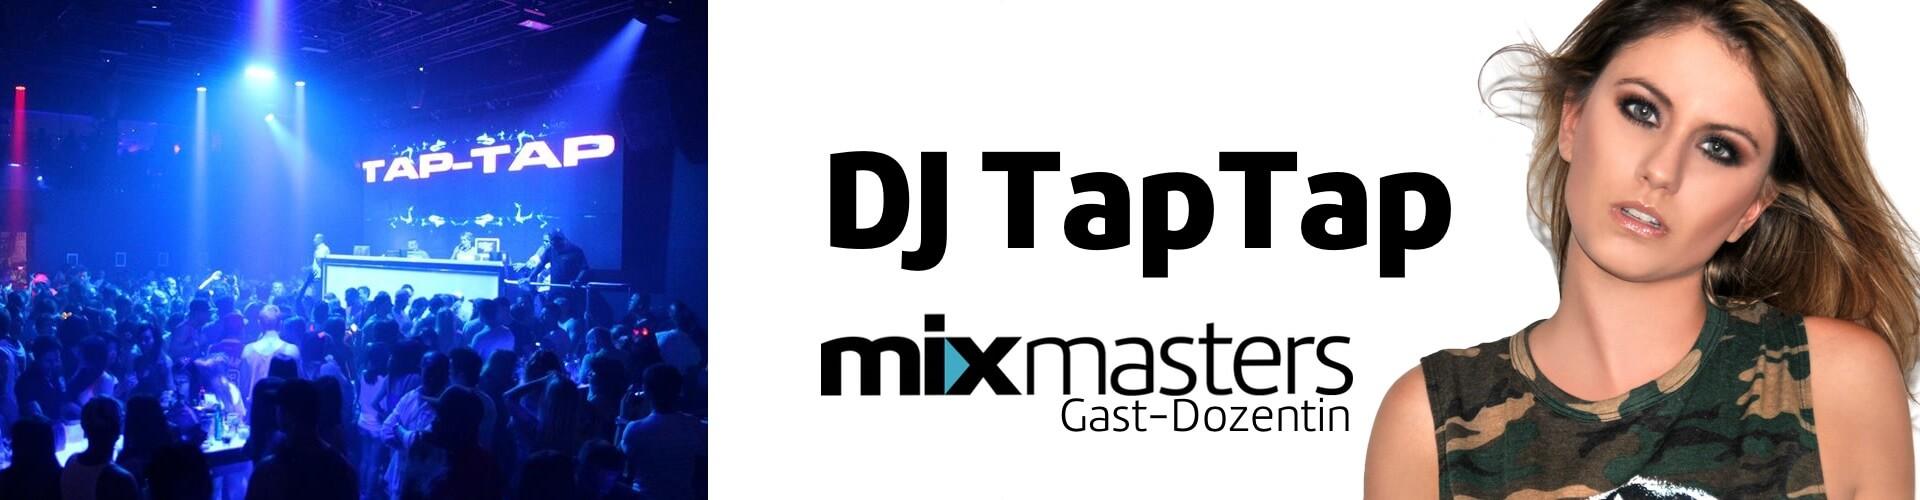 Gratis DJ Seminar für Dich – She DJ Tap Tap (Top 100 DJs Worldwide)